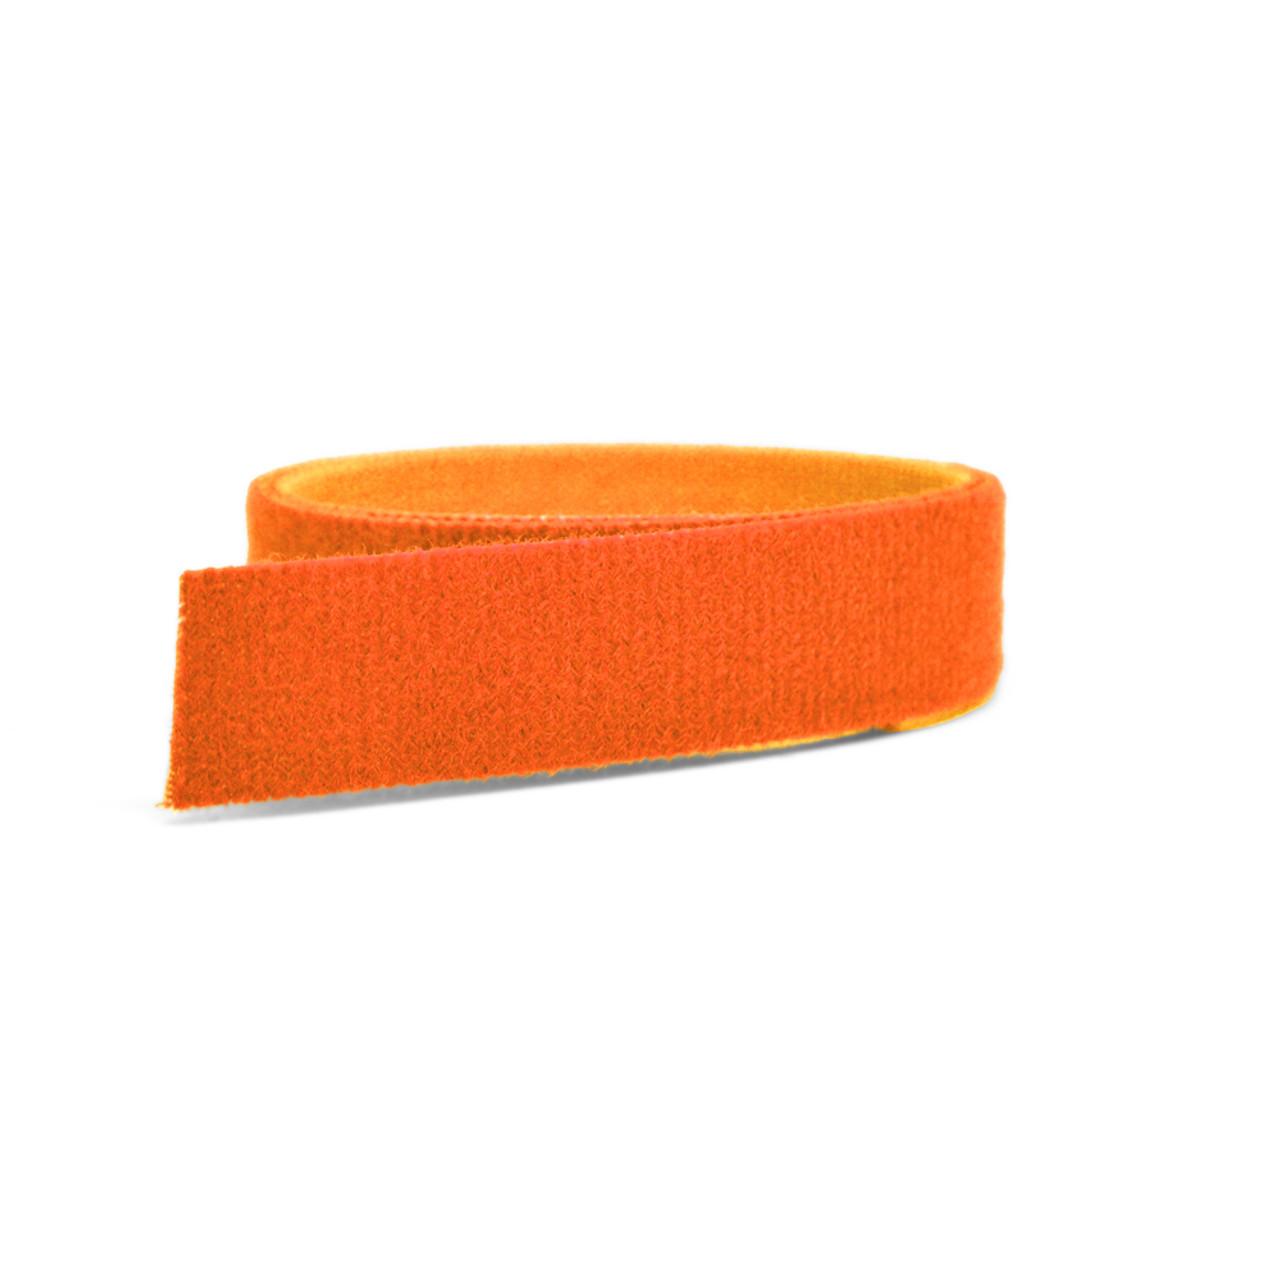 VELCRO® Brand ONE-WRAP® Tape Orange Mini Rolls